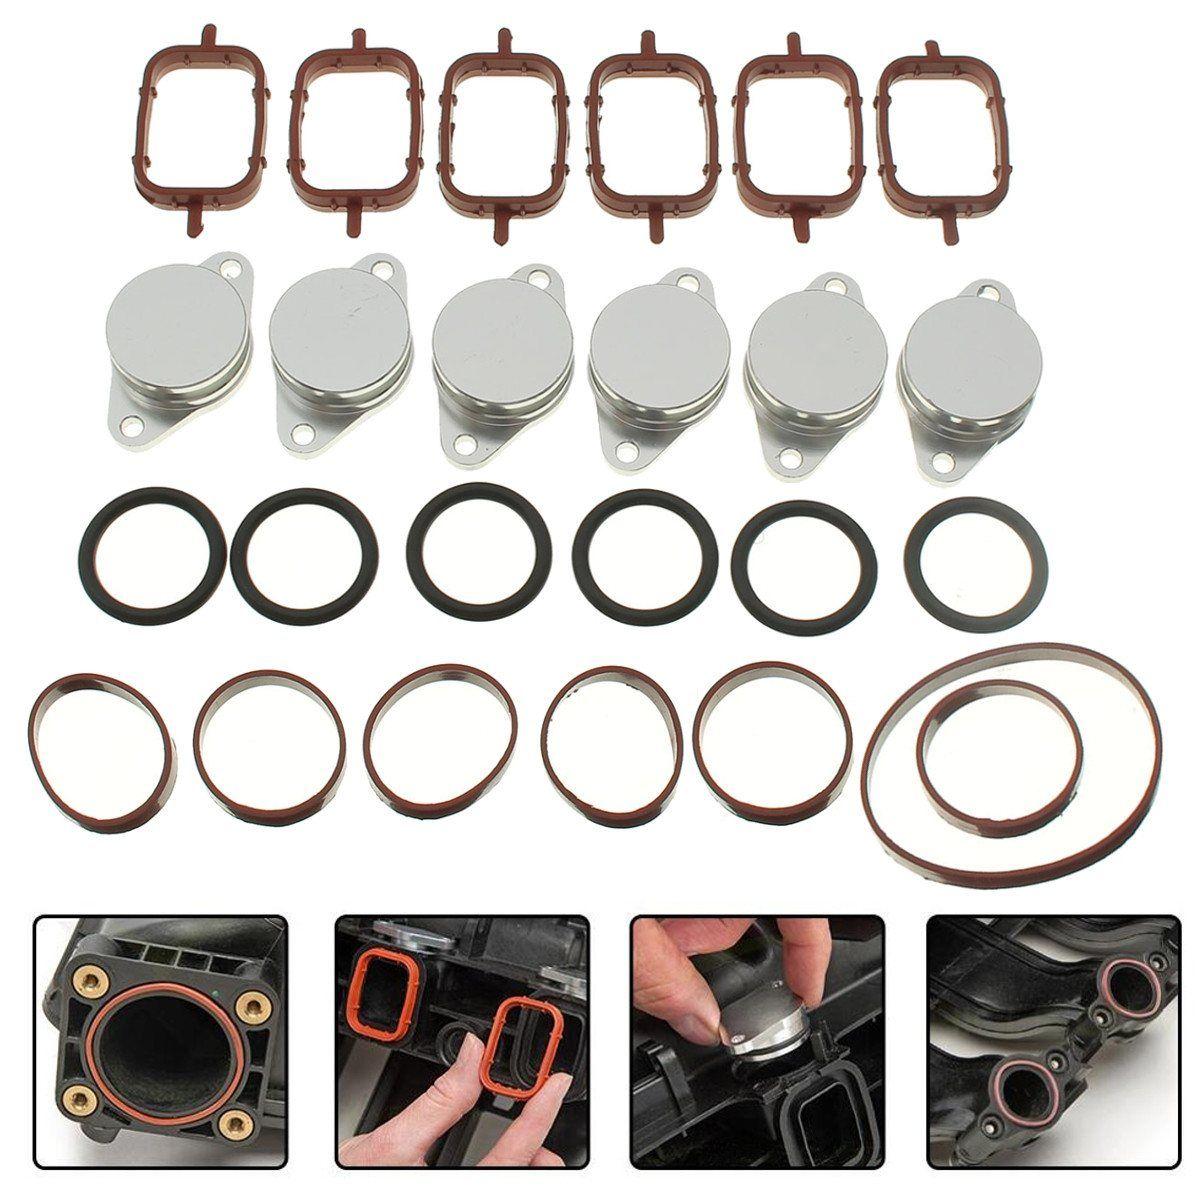 6x 32-33mm Swirl Flap Blank Bungs Mit Saugrohr Dichtungen Für BMW E38 E39 E46 E53